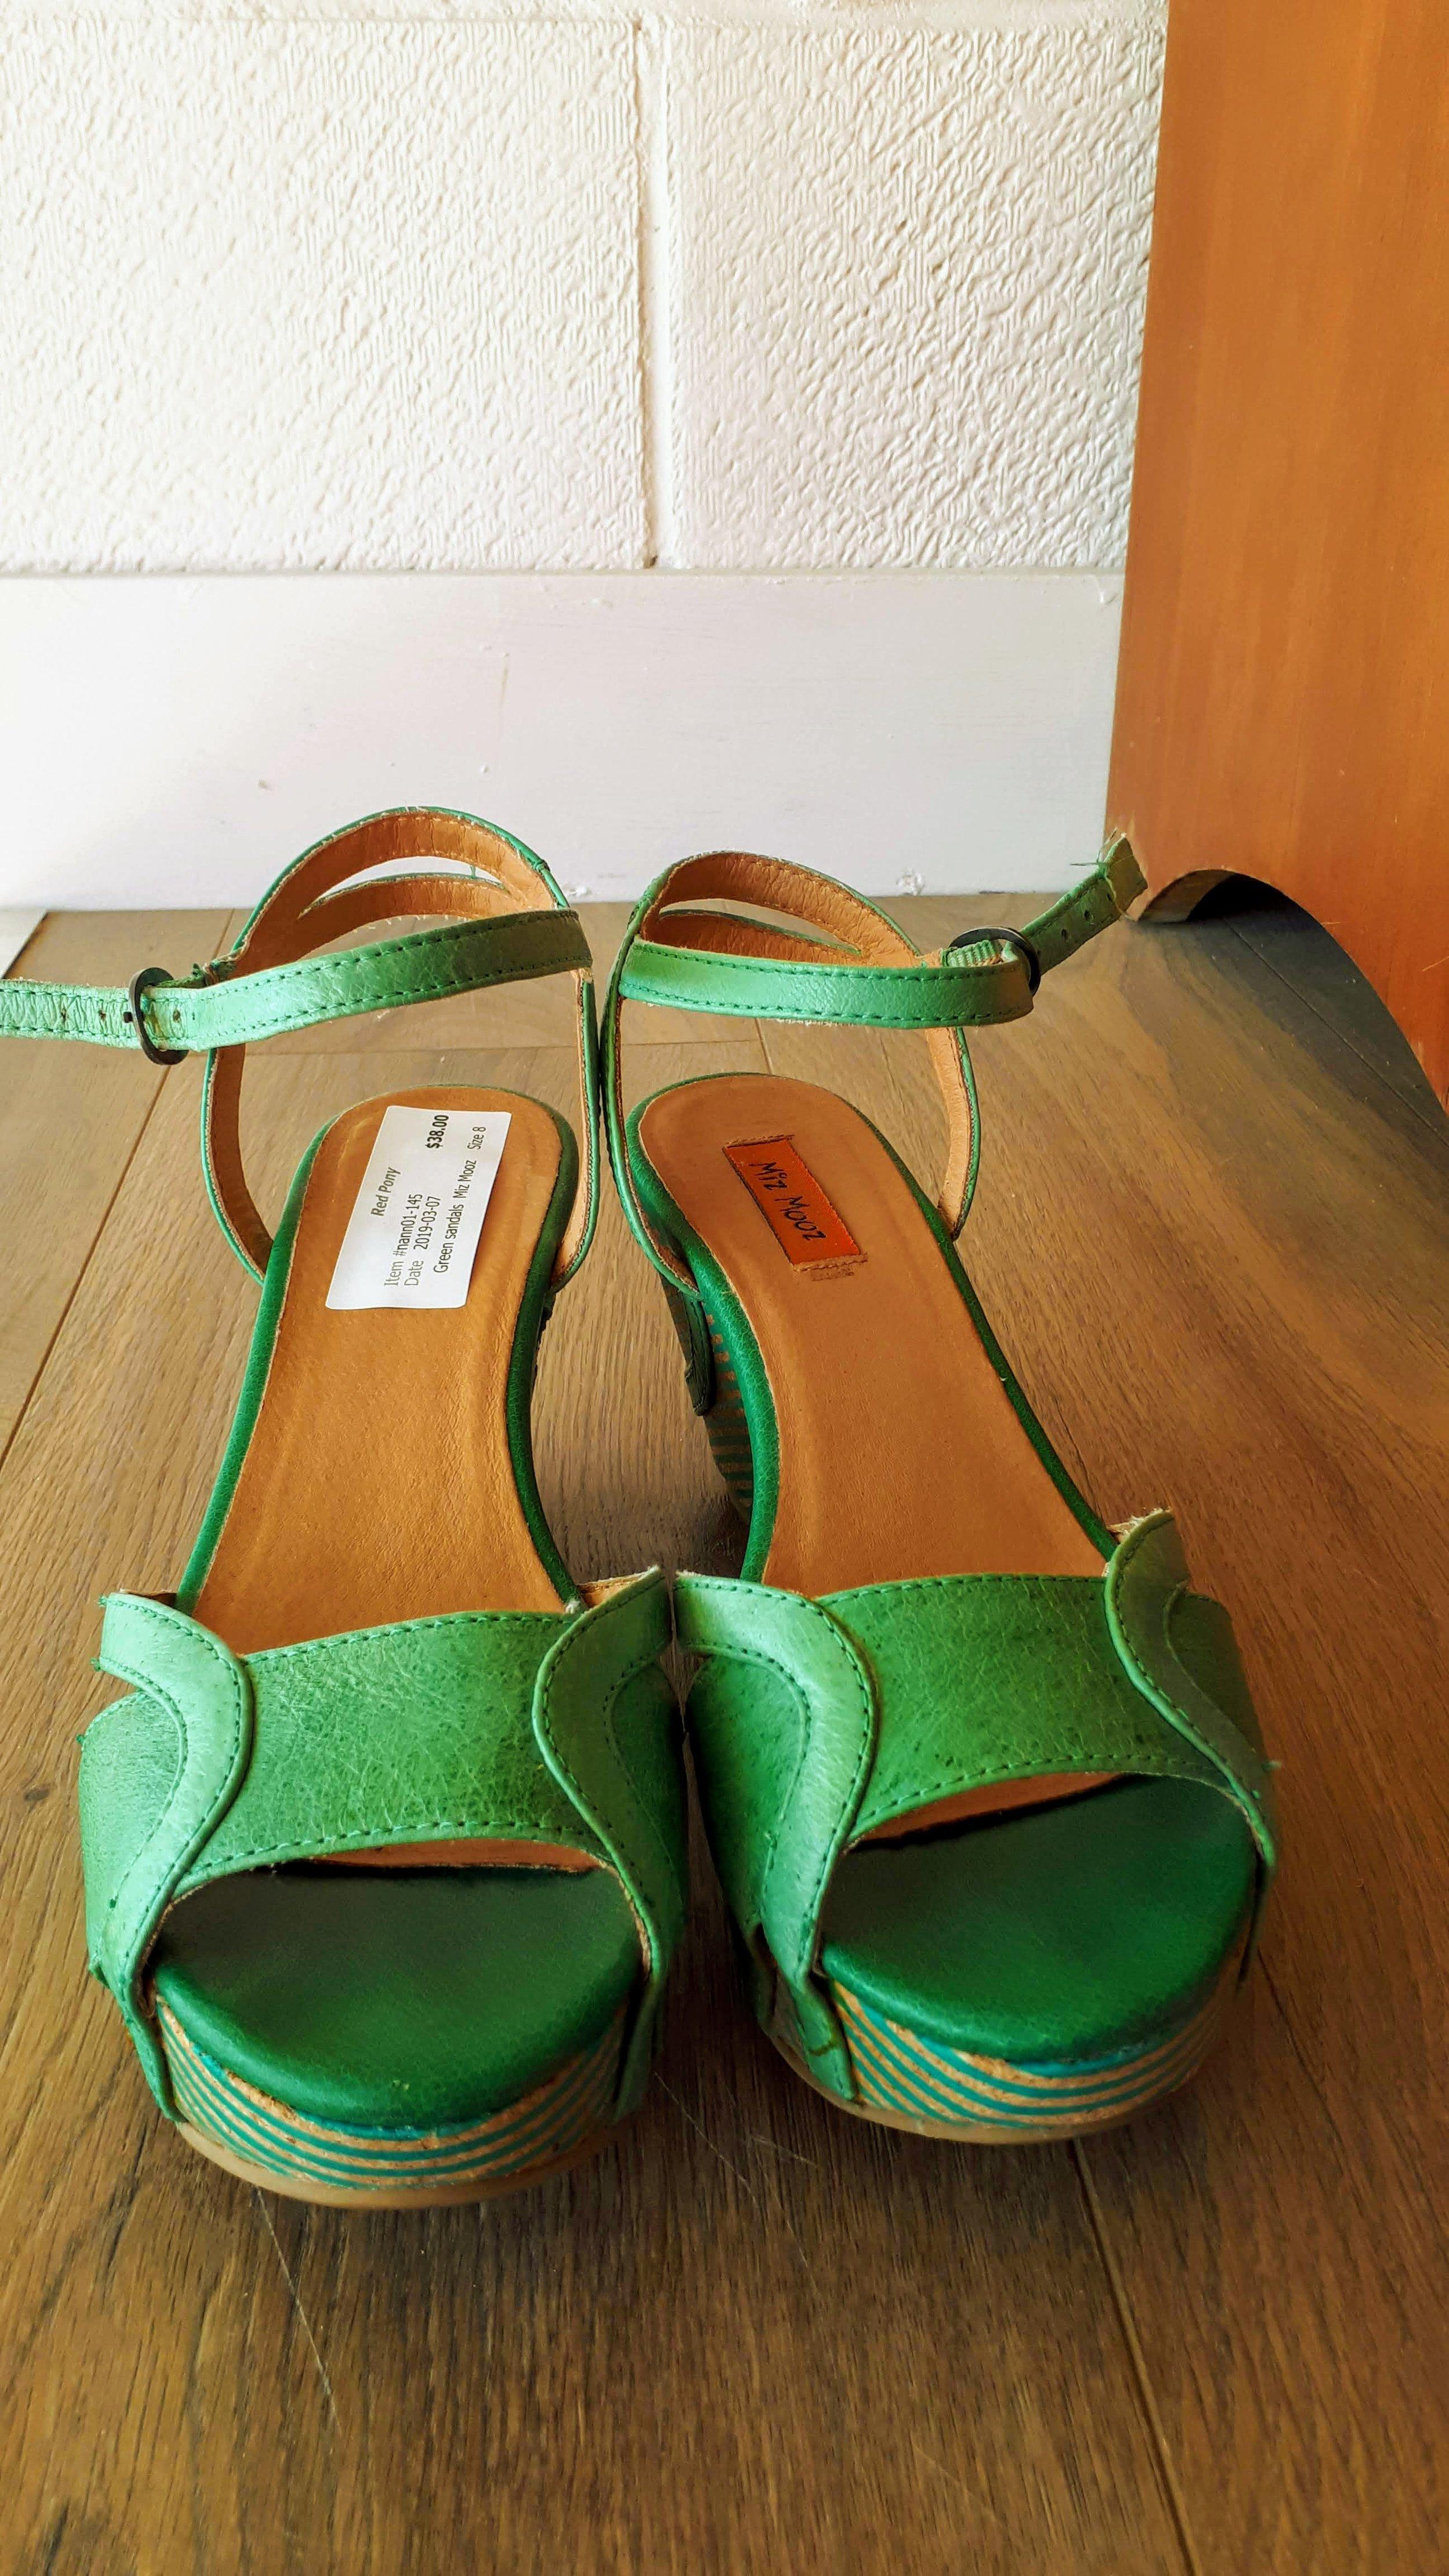 Miz Mooz shoes; S8, $38